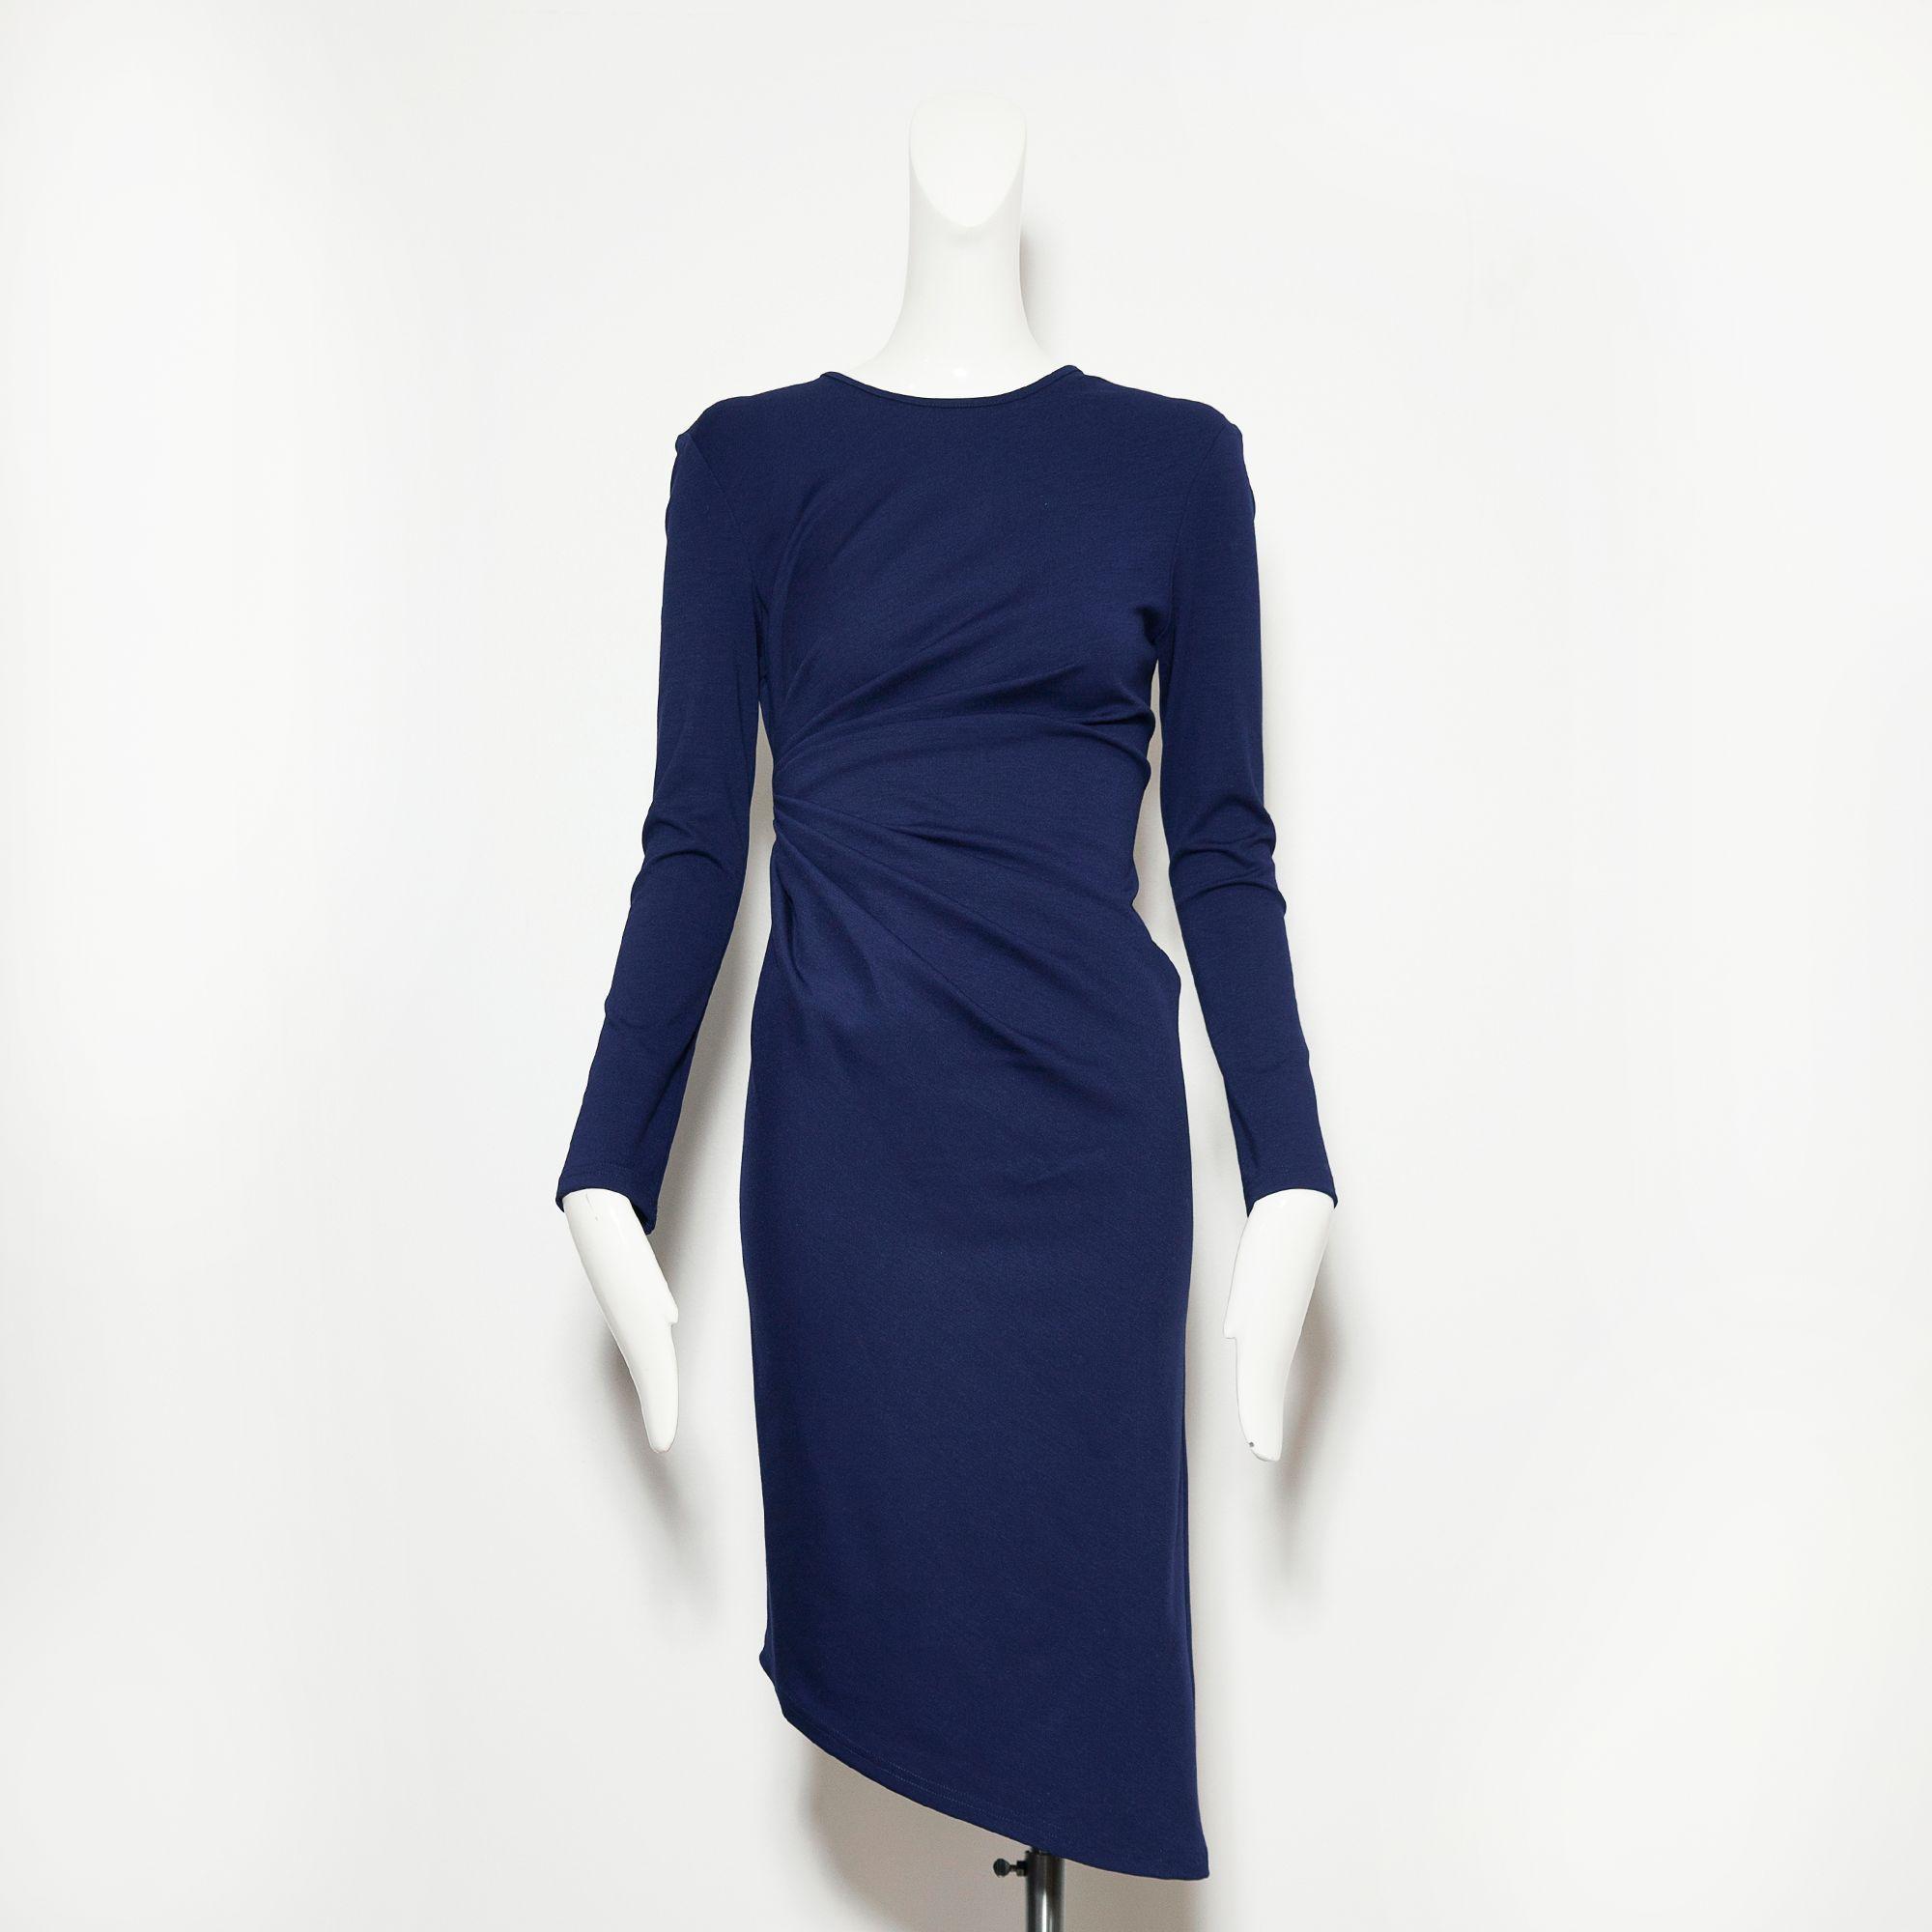 Cienega Dress | Zephyr